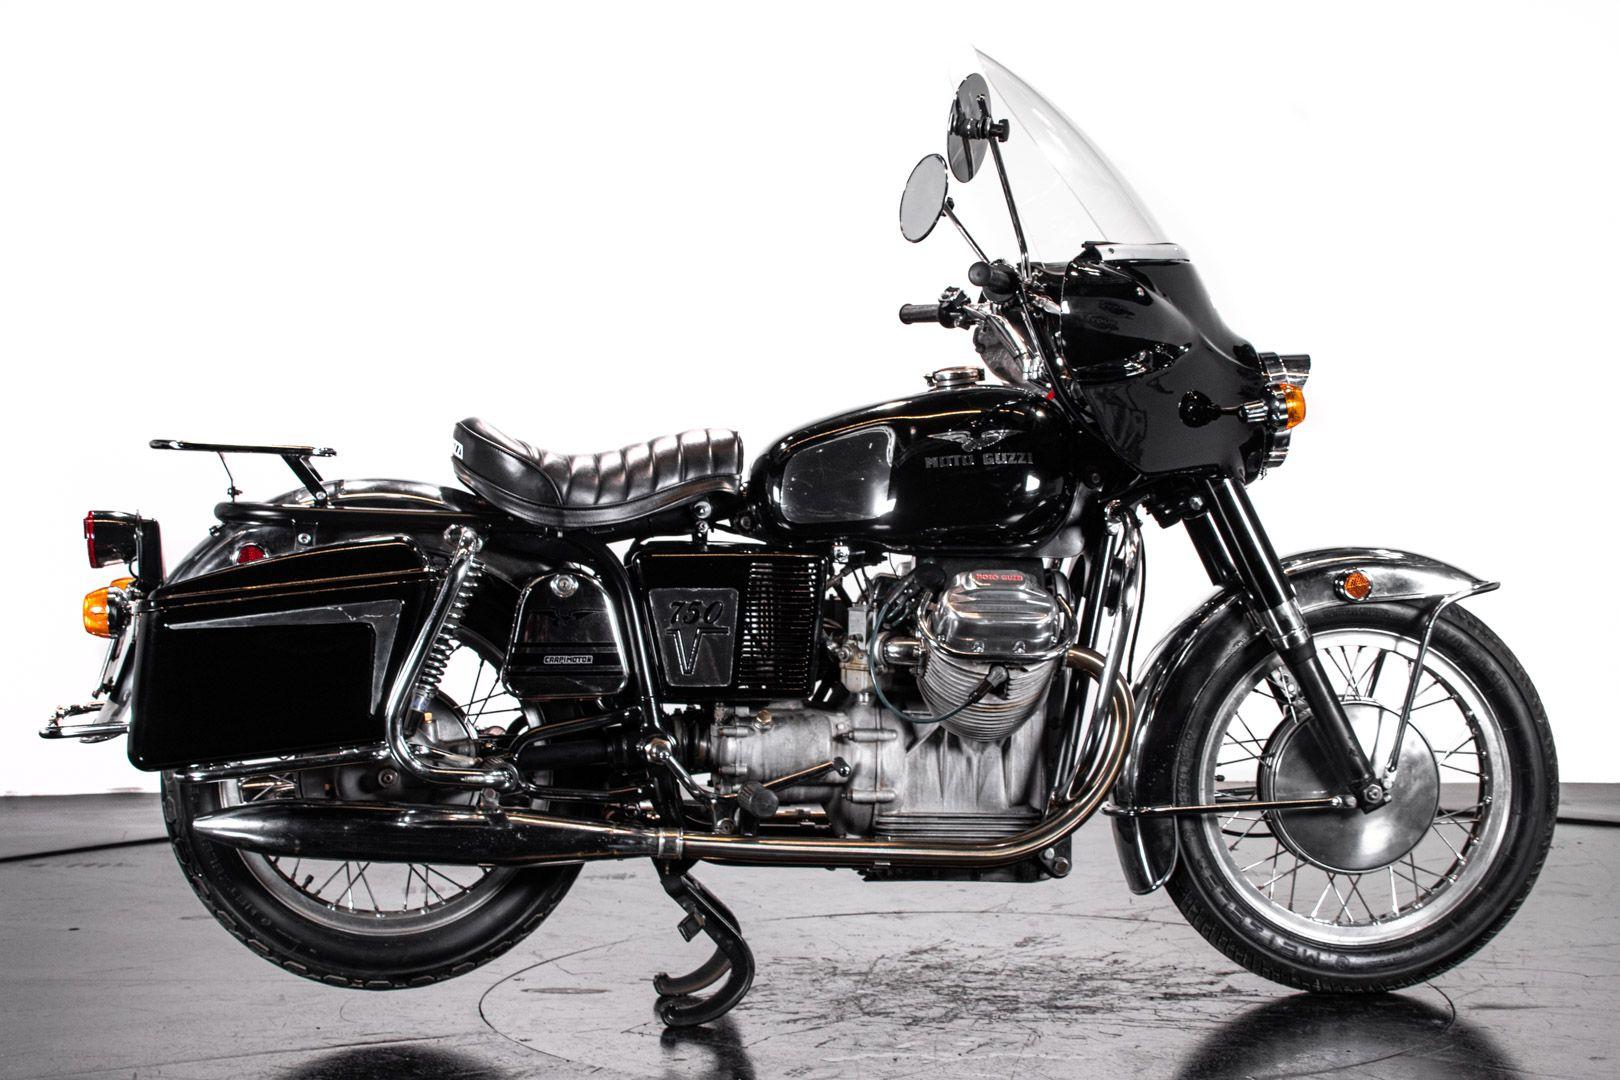 1969 Moto Guzzi V7 Special 81469